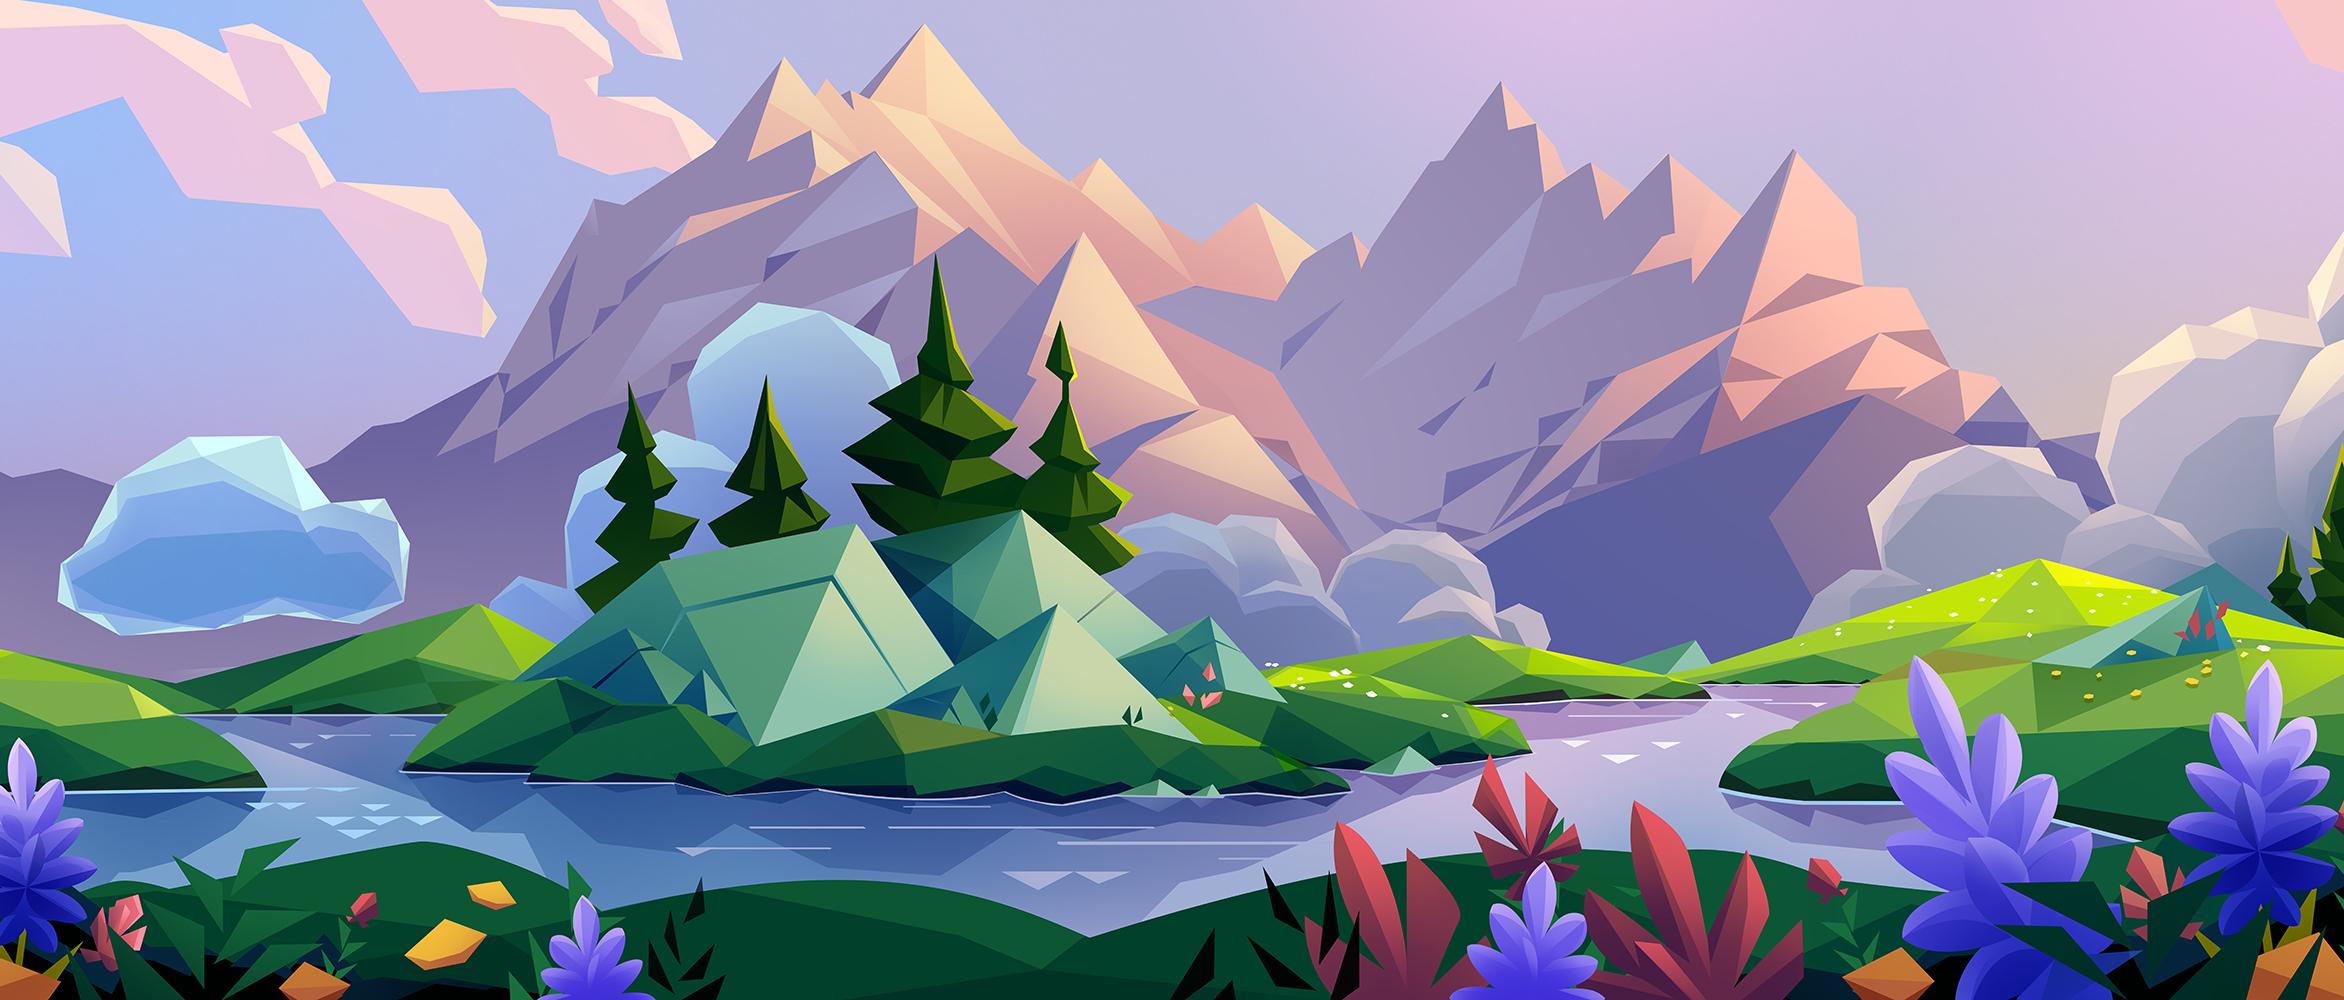 Poco_Mural_flat_fullsize_002.jpg